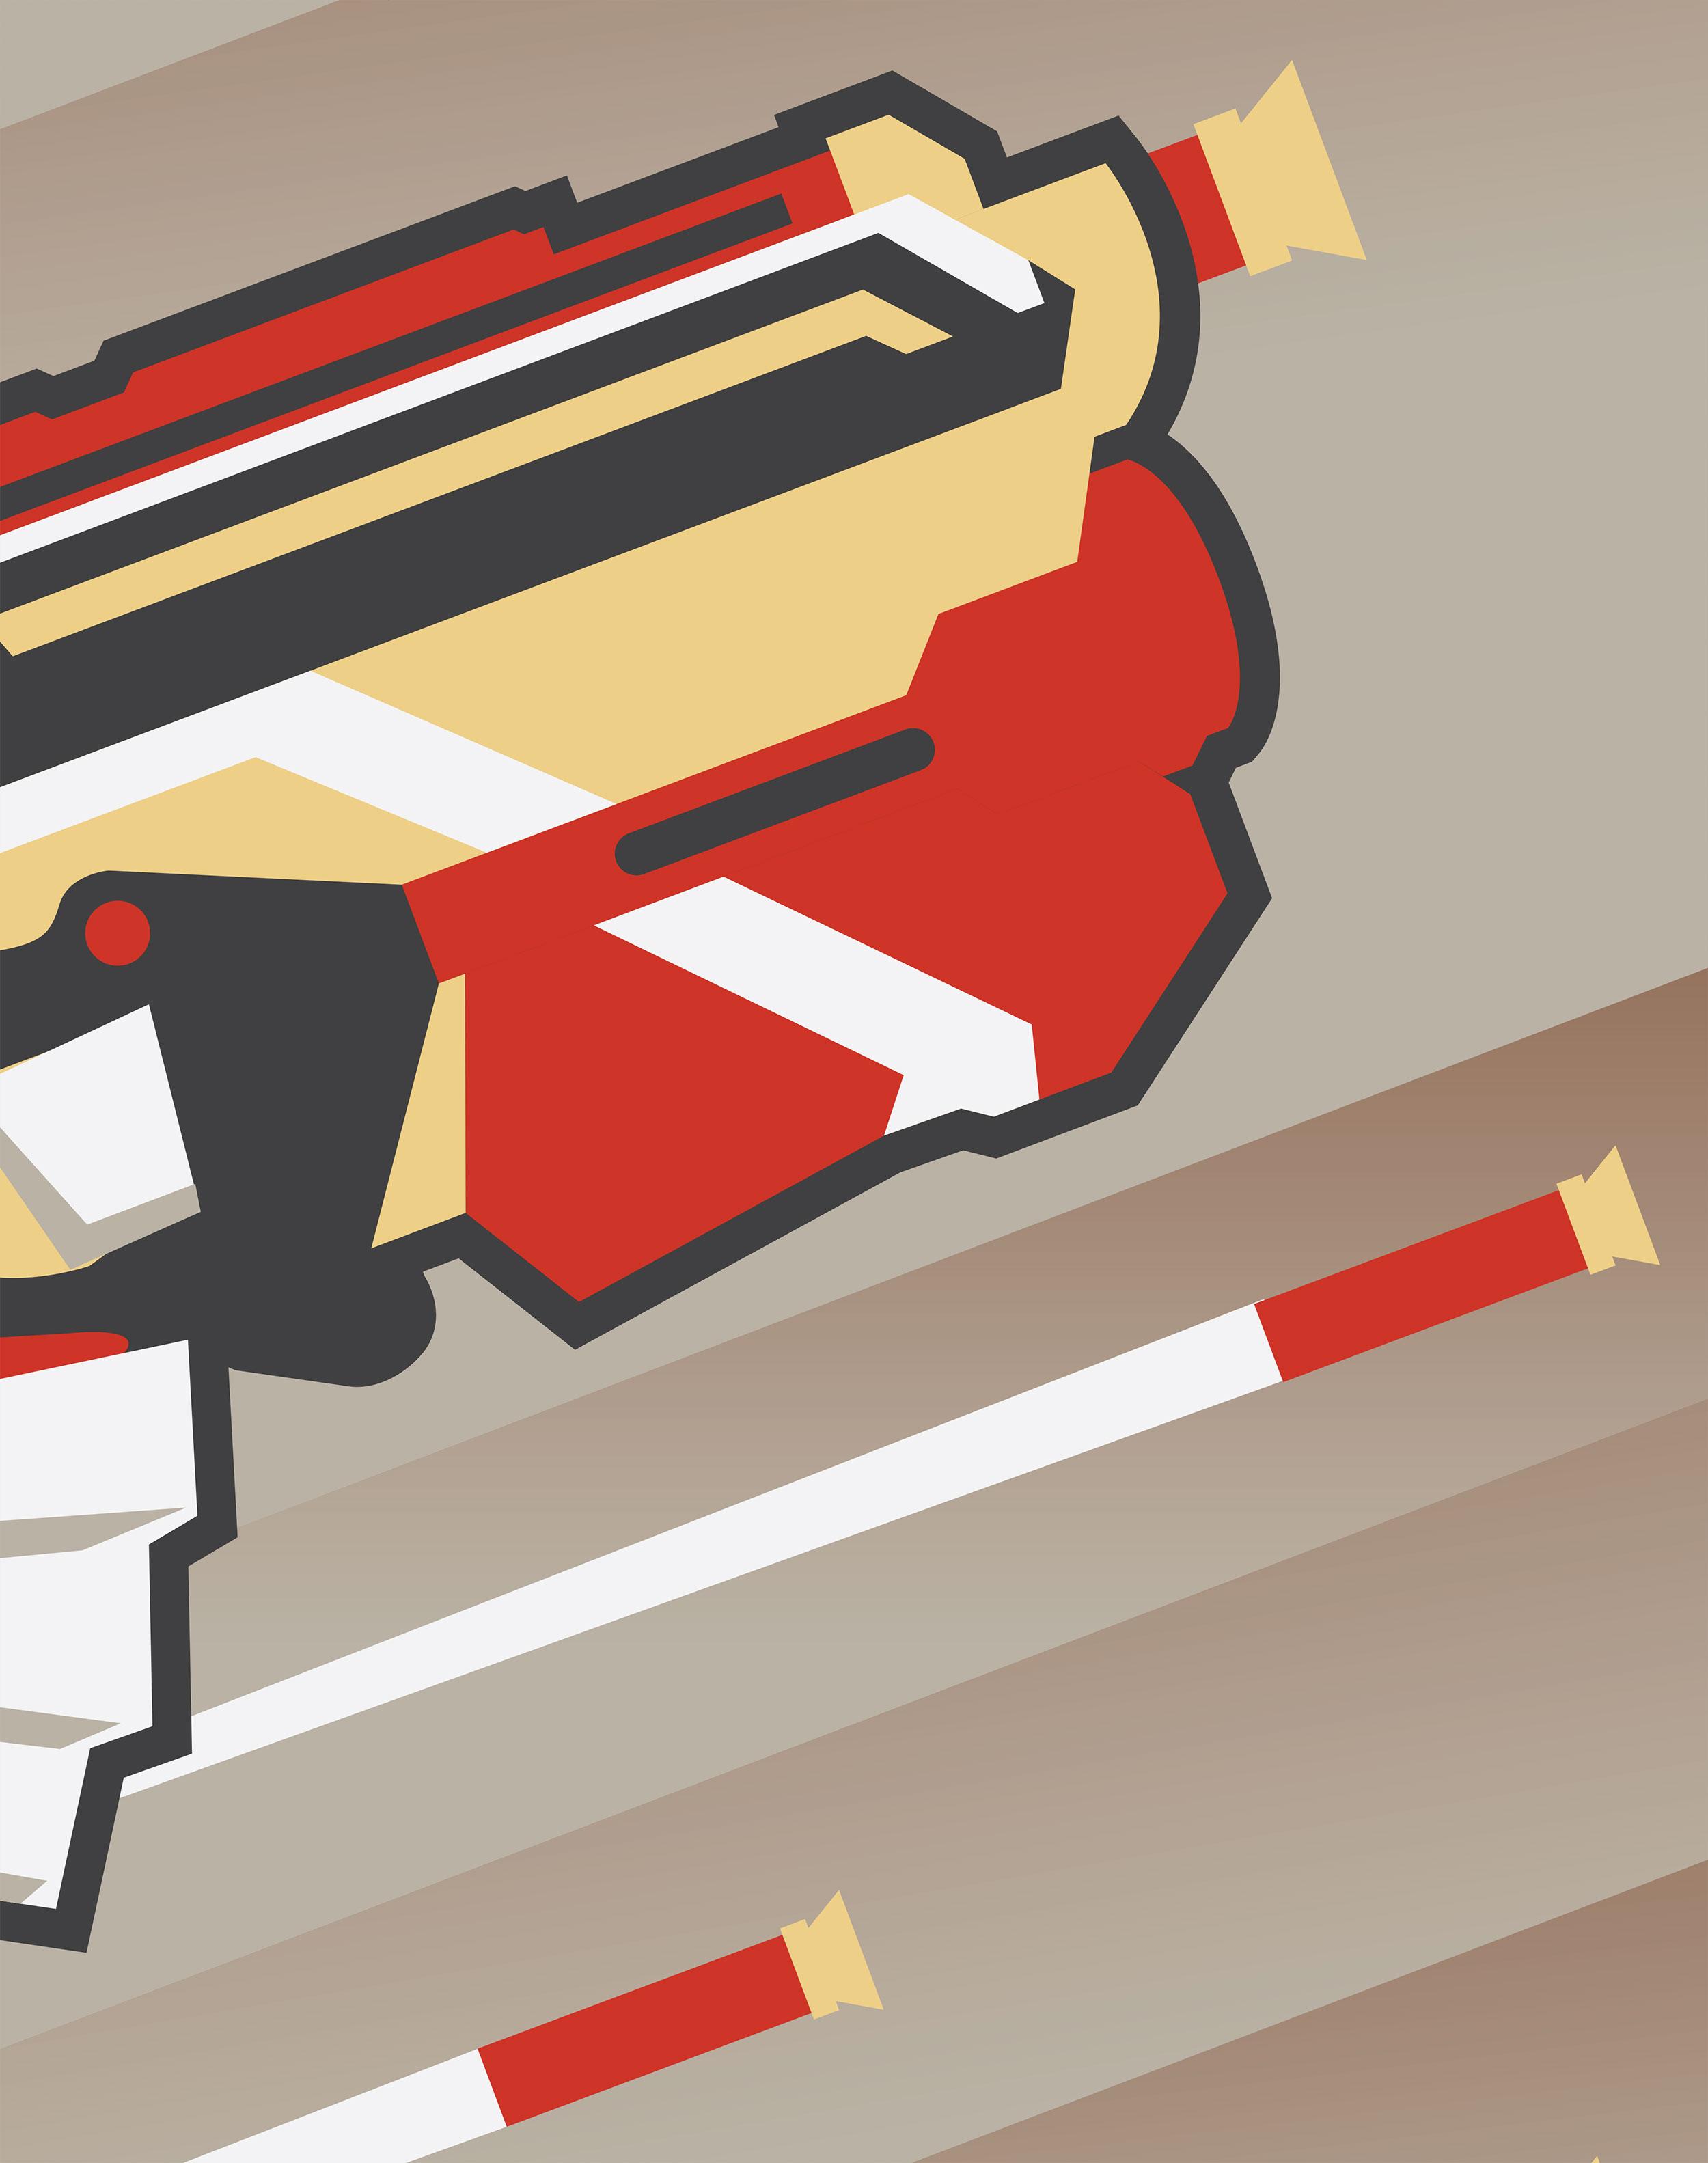 Illustrations_Posters_mockup_nerf2b.jpg